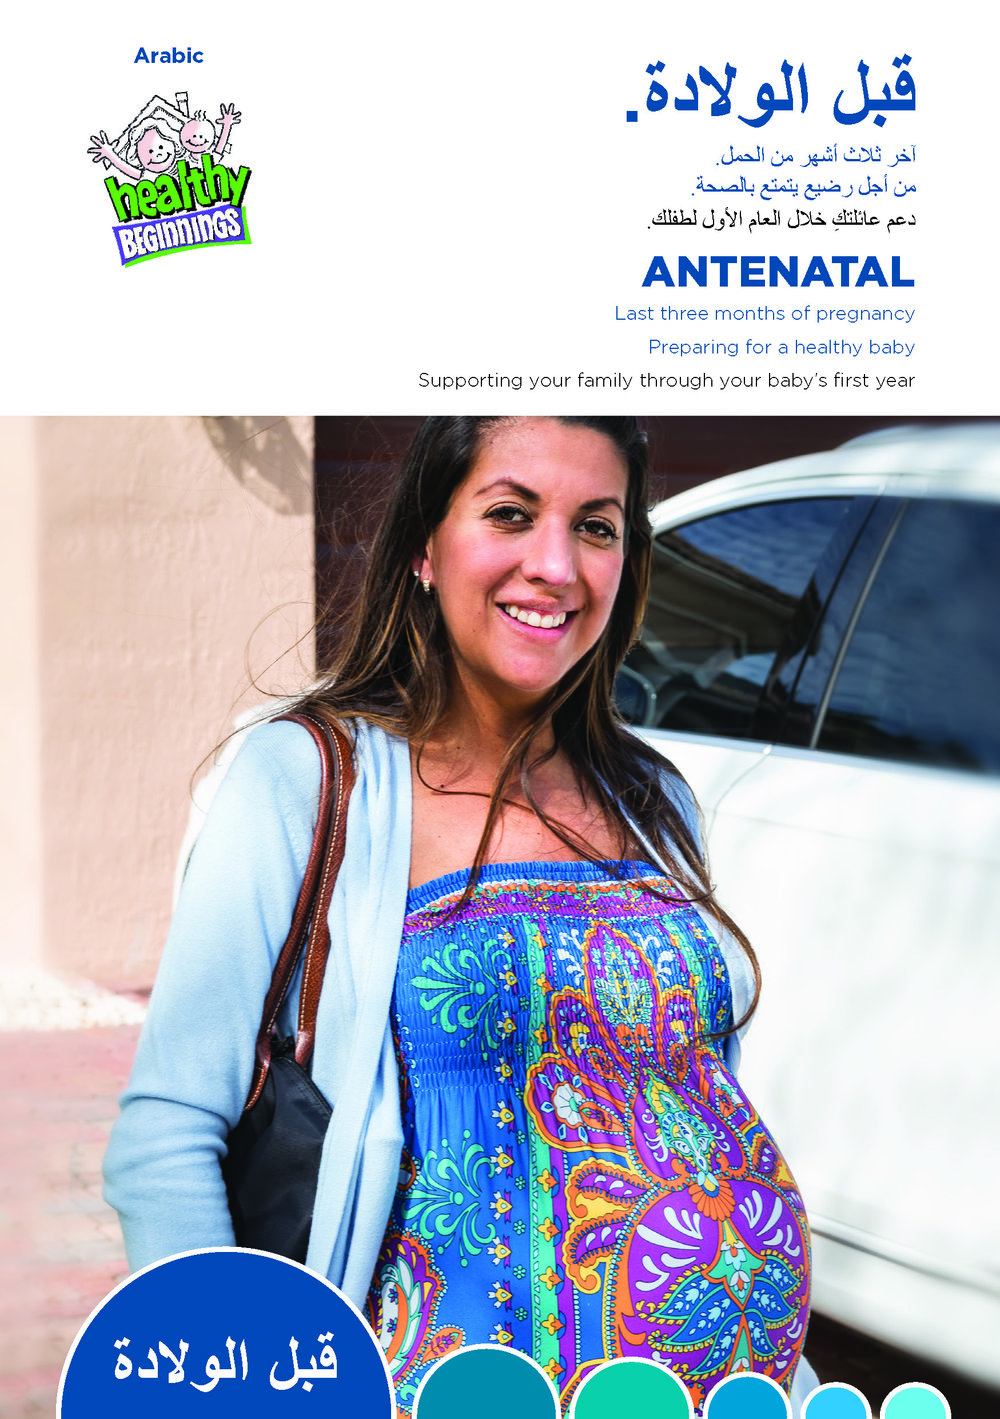 BOOKLET 1 ANTENATAL ARABIC_v6 (FINAL).jpg